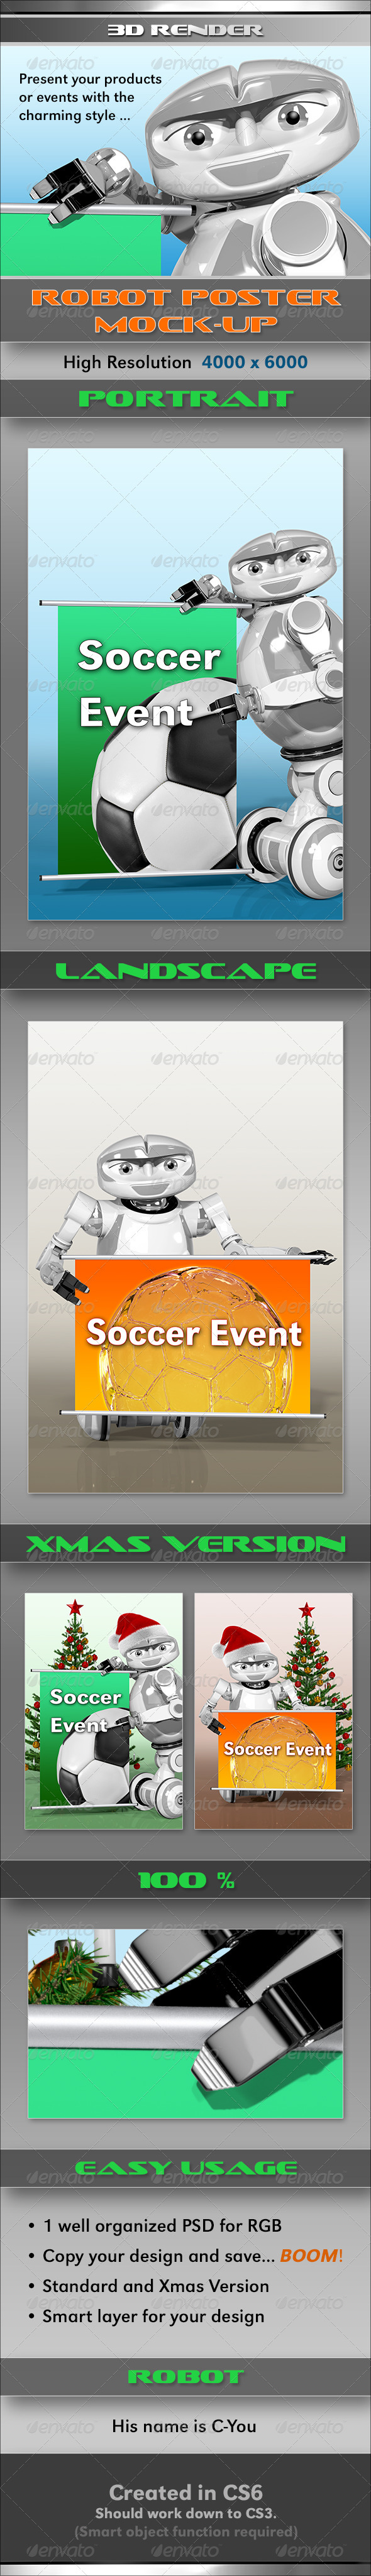 GraphicRiver Robot Poster MockUp 3656674